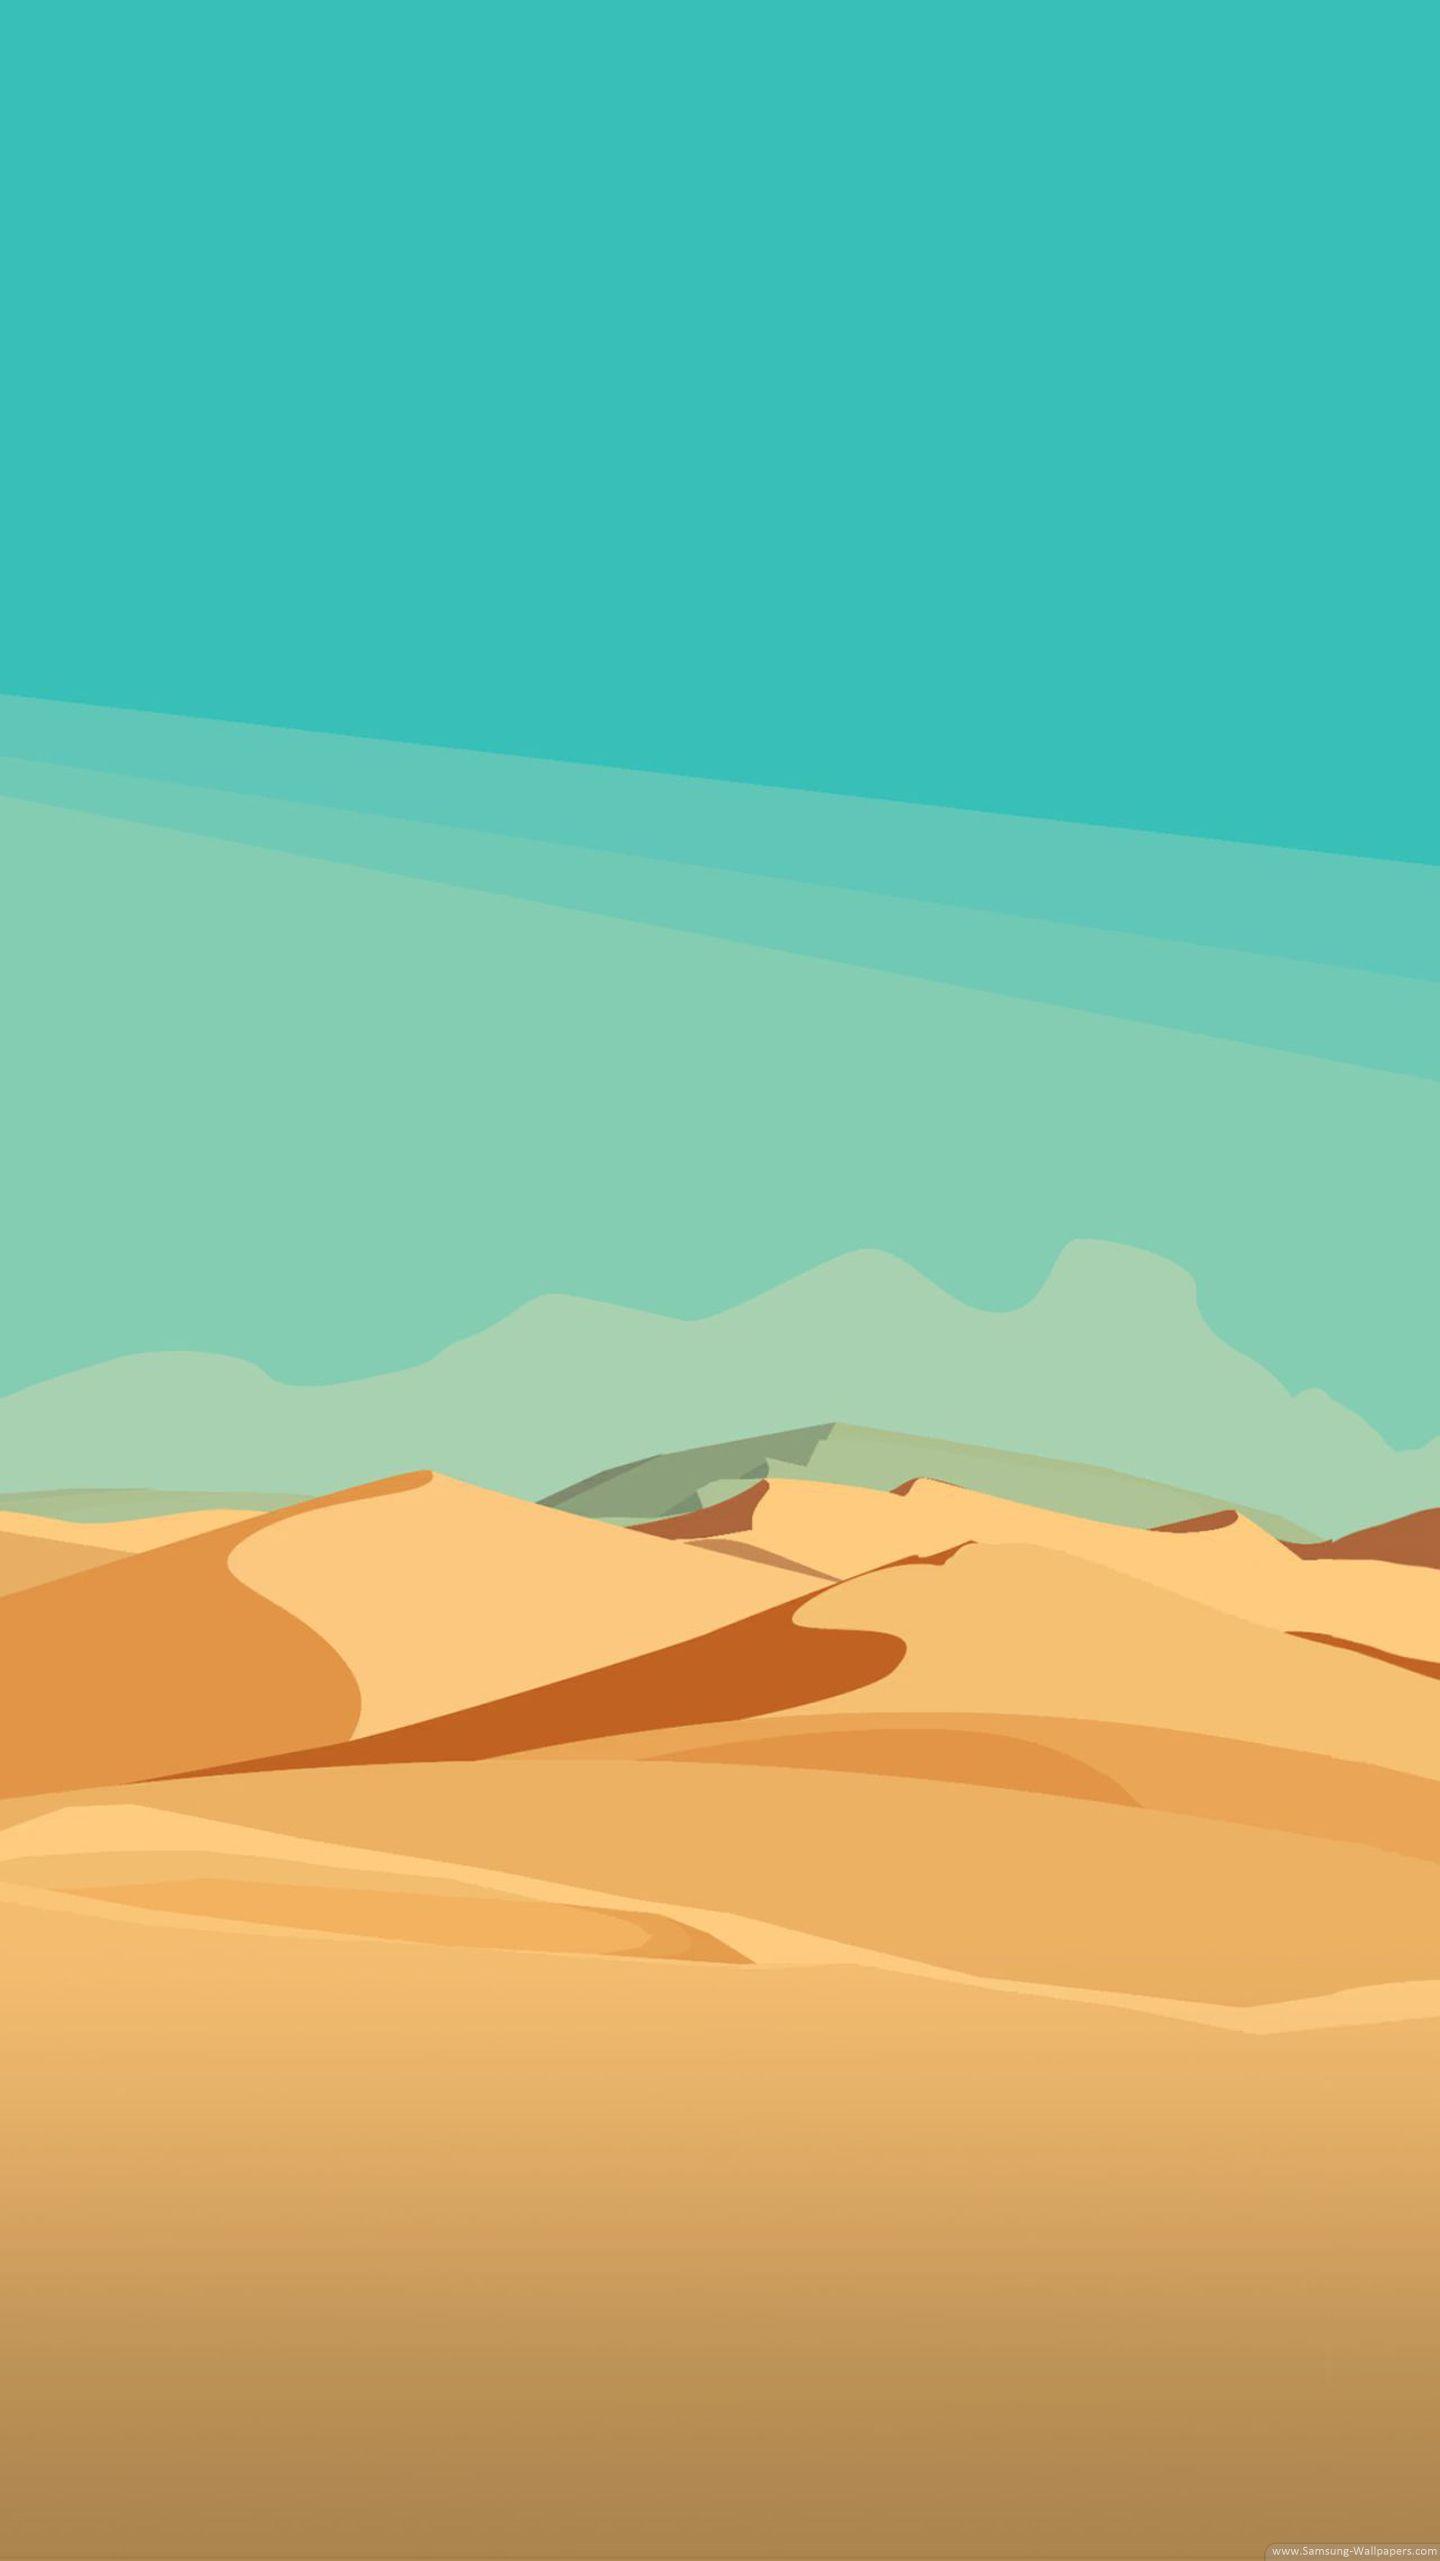 Desert Scenery Wallpapers Wallpapers Scenery Wallpaper Minimal Wallpaper Minimalist Wallpaper